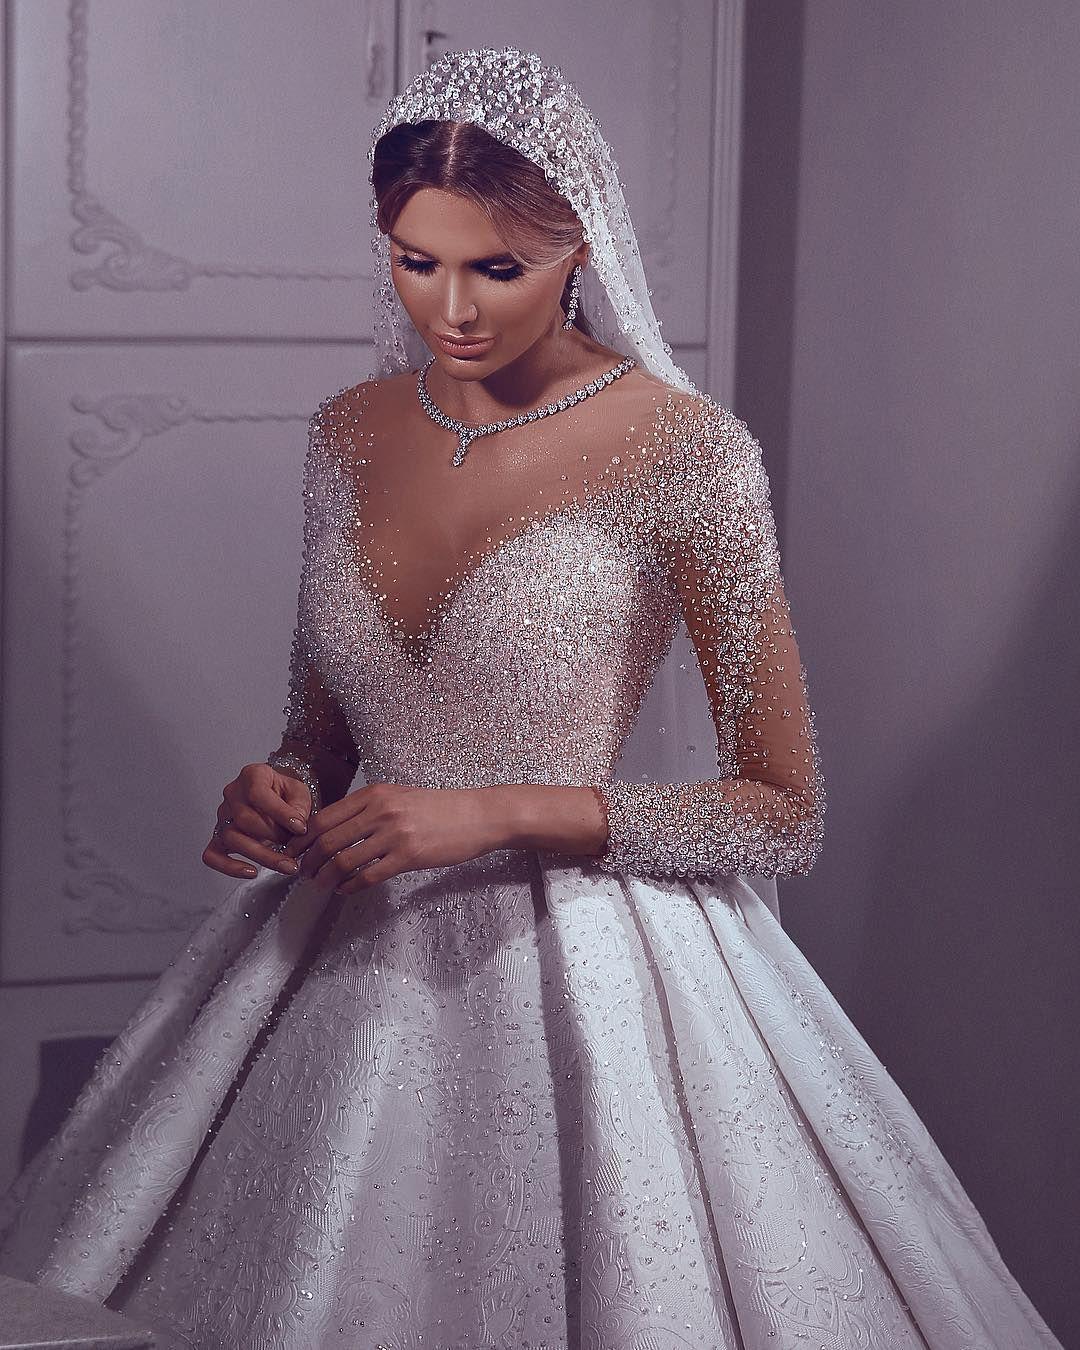 Sadek Majed Bridal On Instagram Couture Bridal Collection 2019 Sadekmajed Sadekmajedcoutu Wedding Dress Couture Ball Gowns Wedding Dream Wedding Dresses